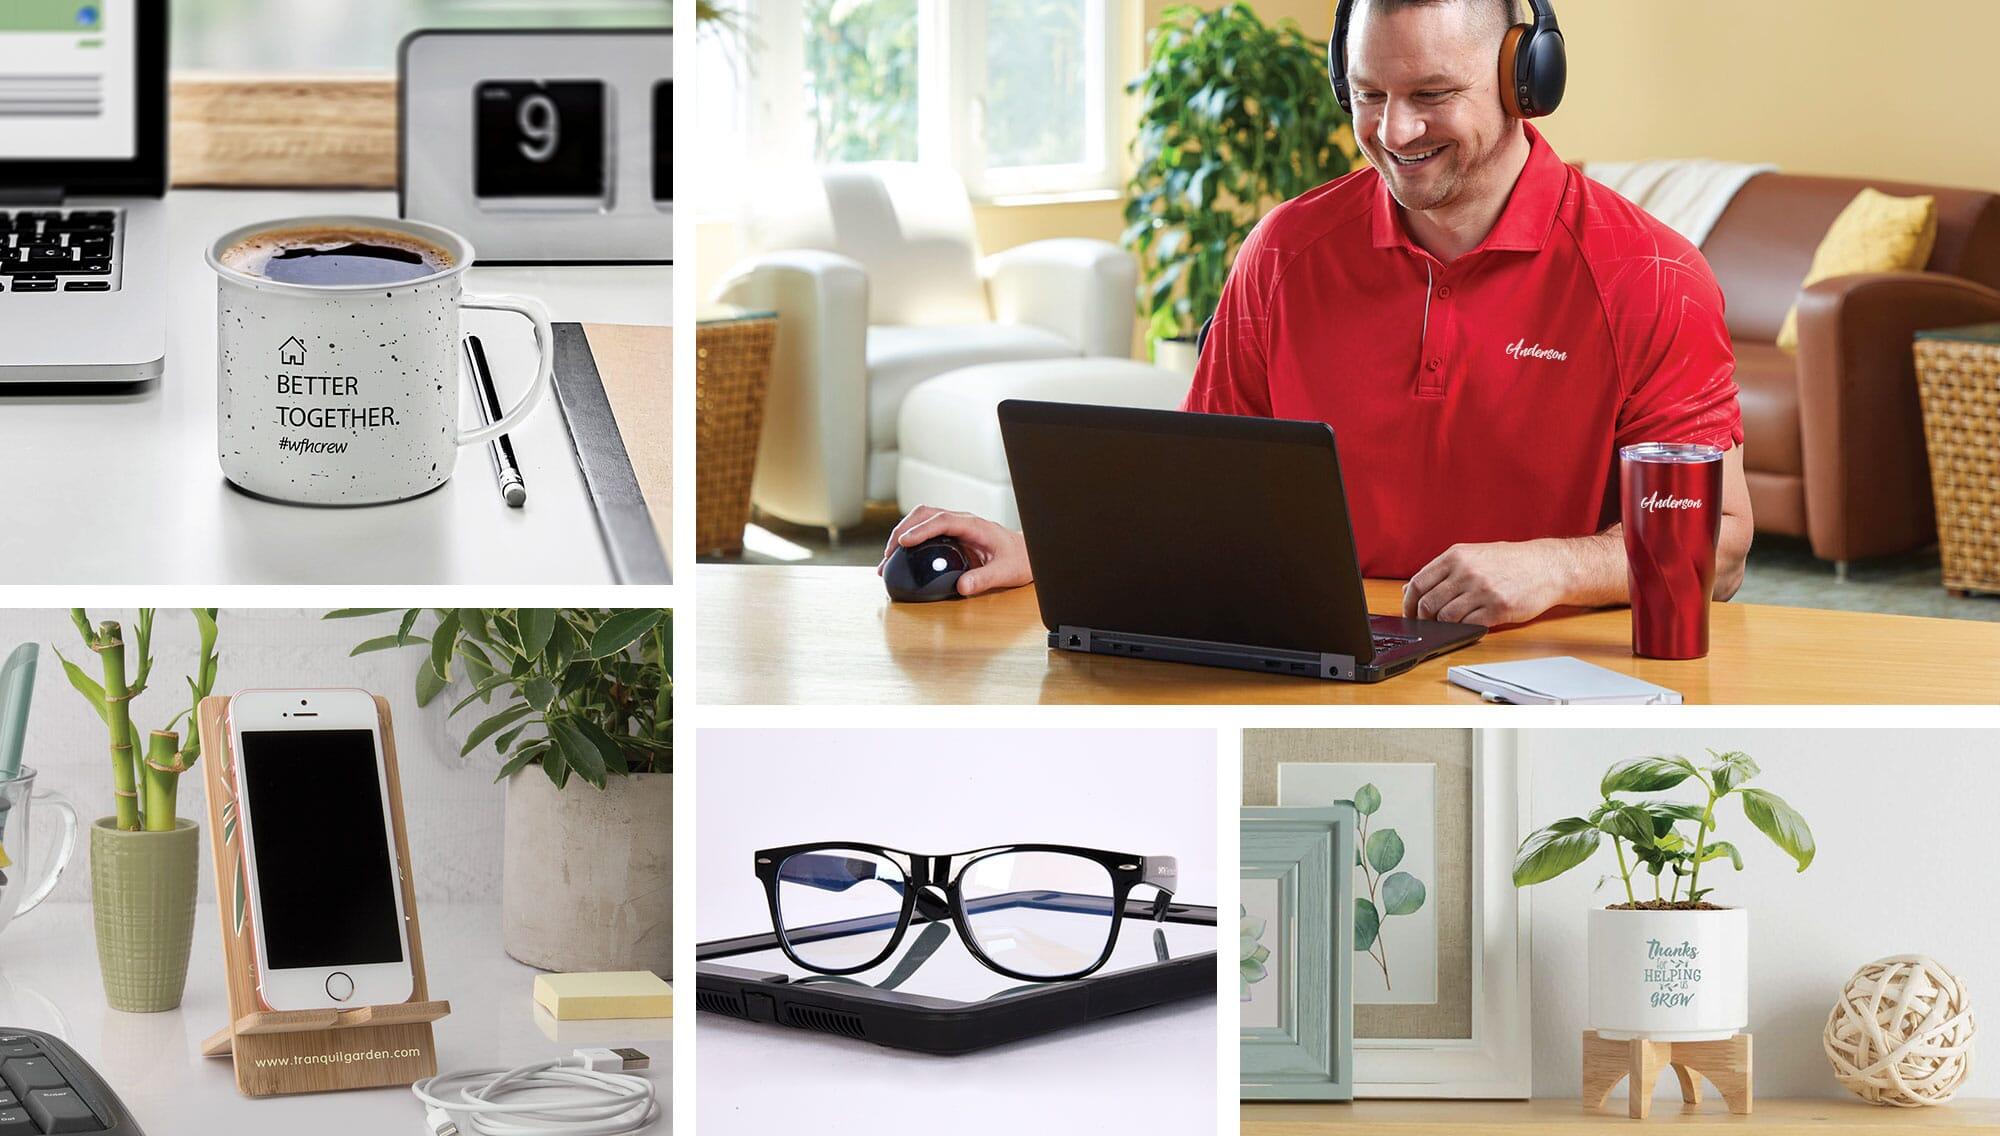 Home Office Desktop Items